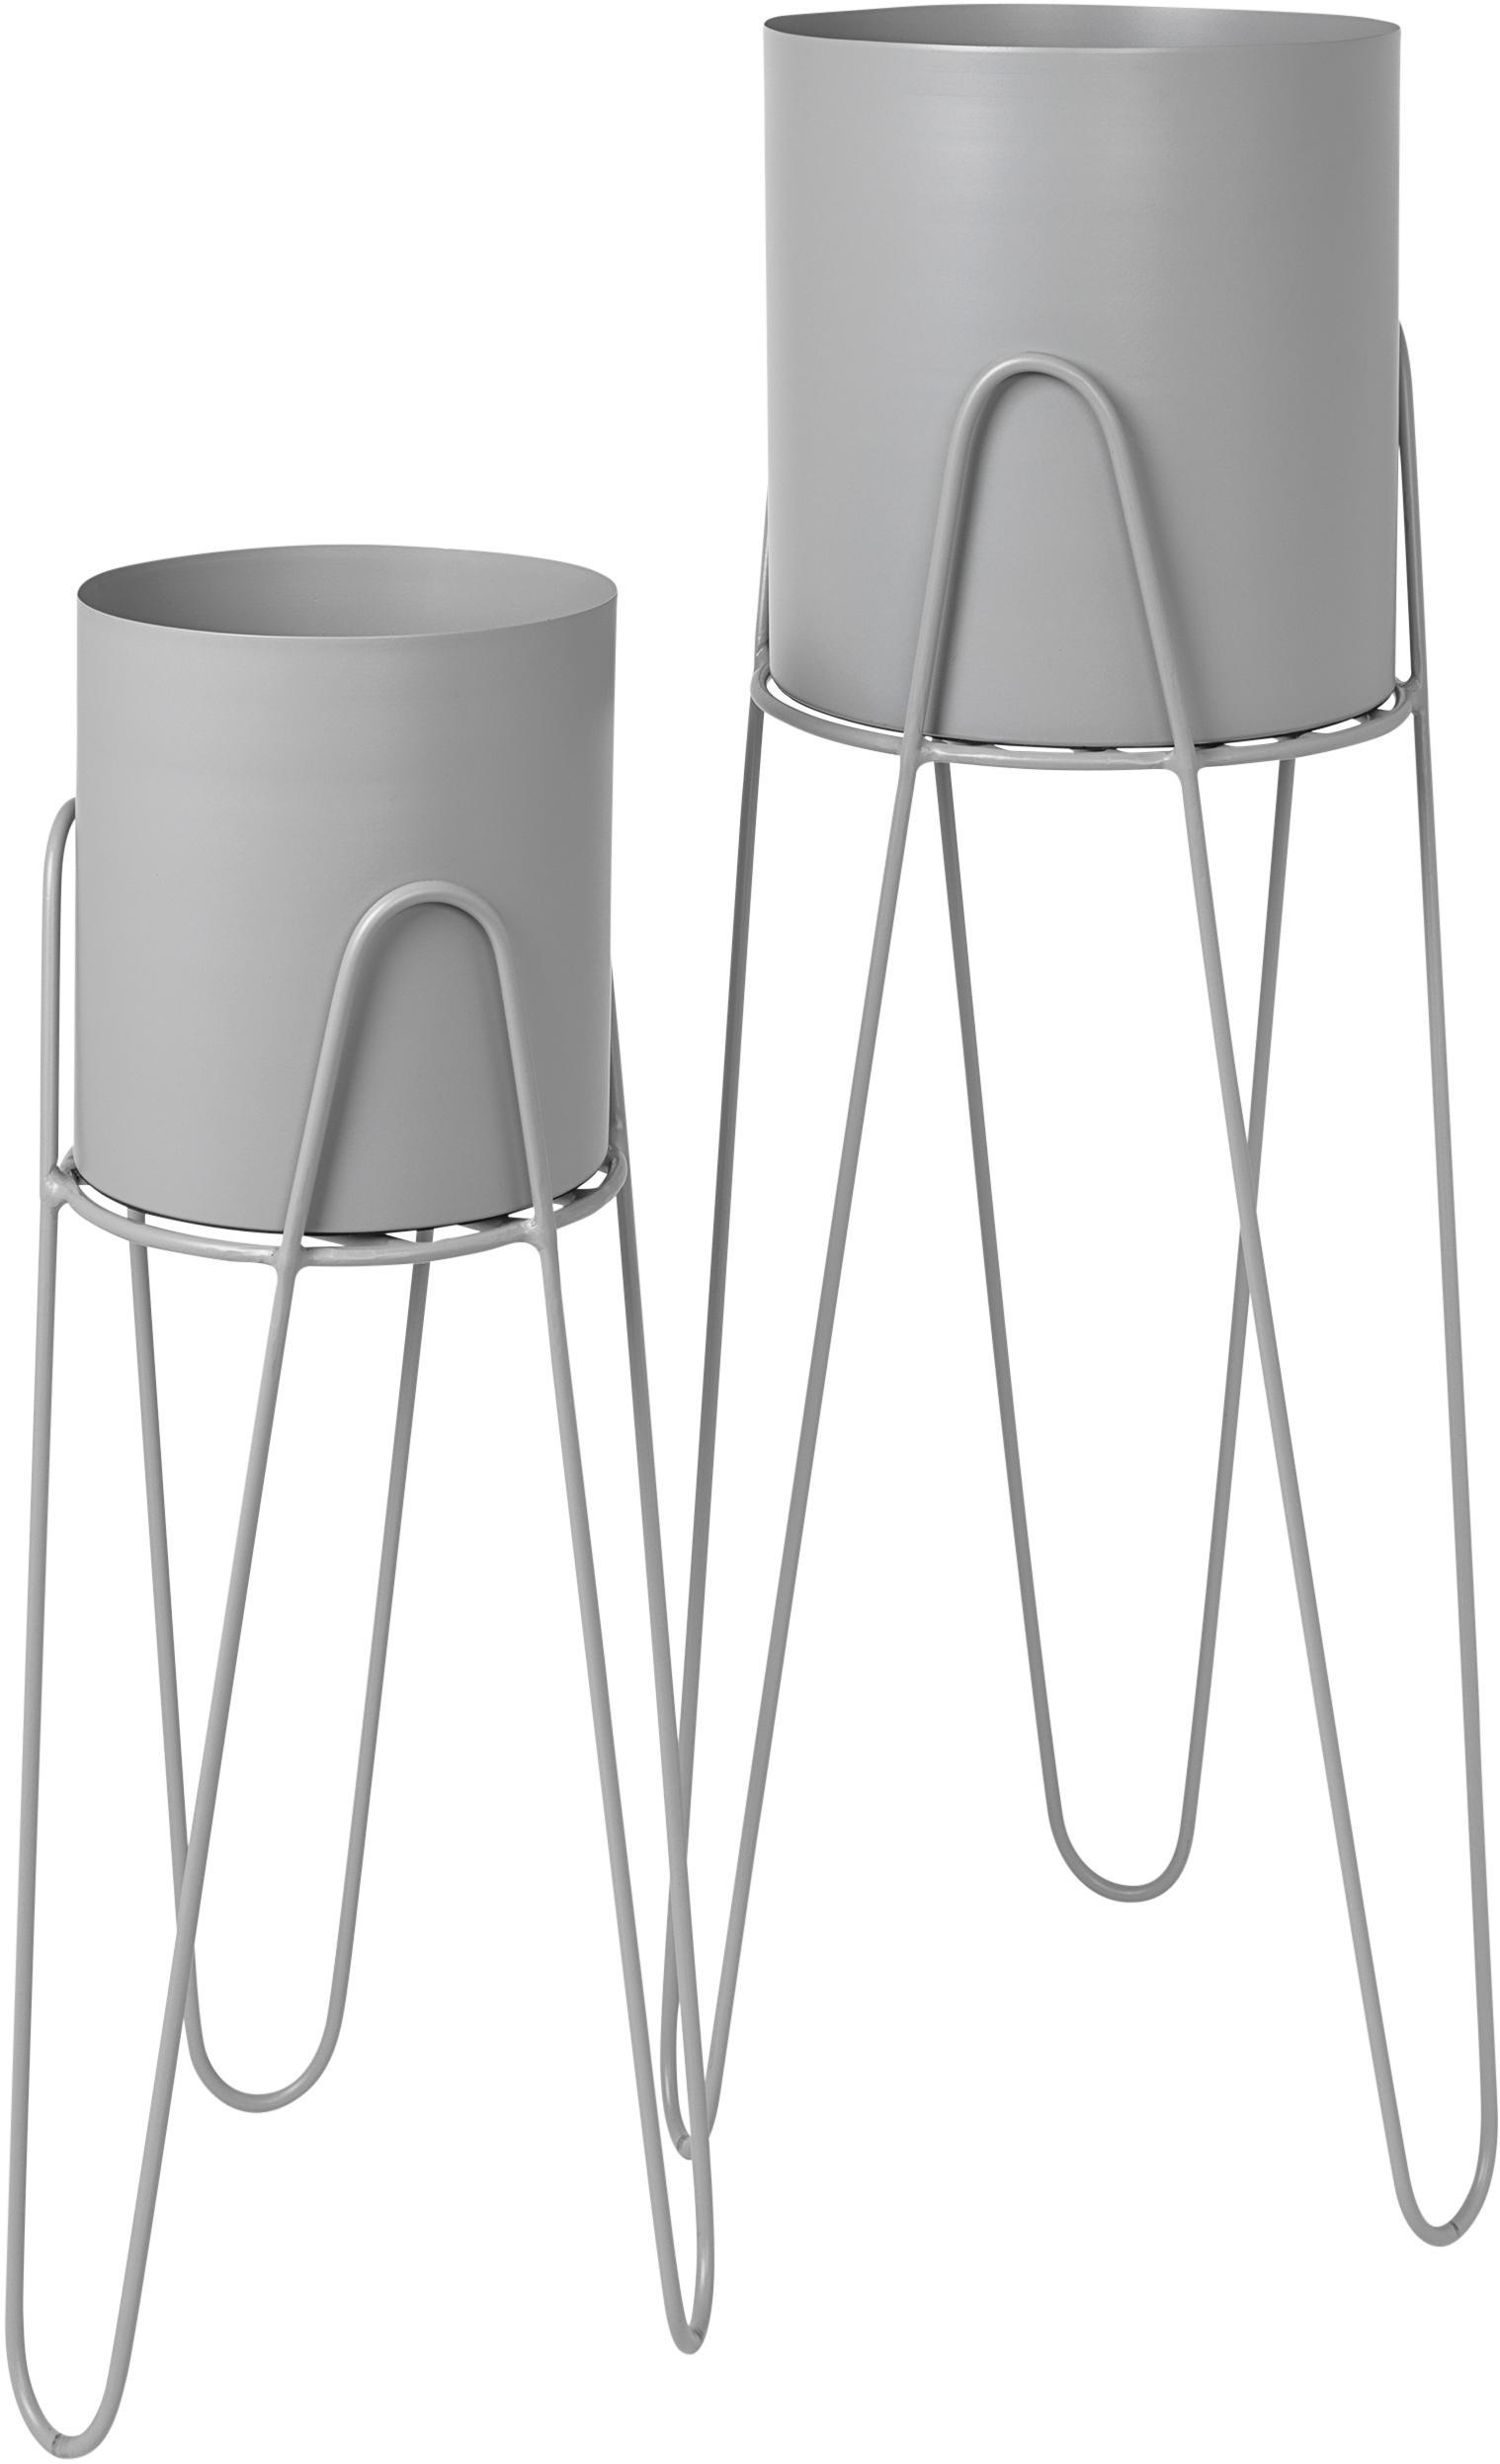 Set 2 portavasi in metallo Lisa, Metallo, Grigio chiaro, Set in varie misure